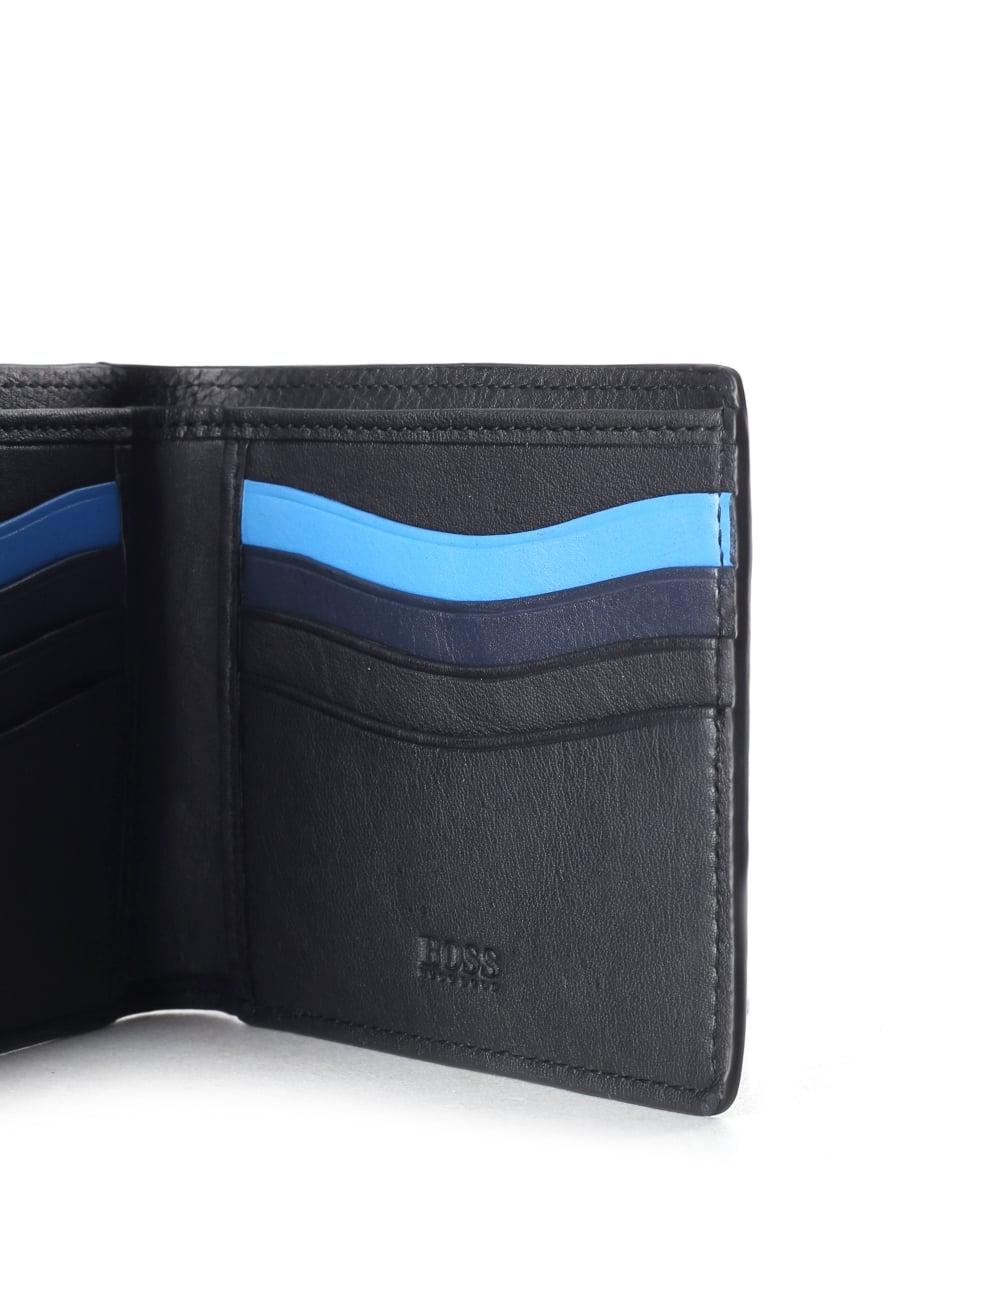 5a00ceceeb1 Boss Black Card Holder   Wallet Men s Gift Set